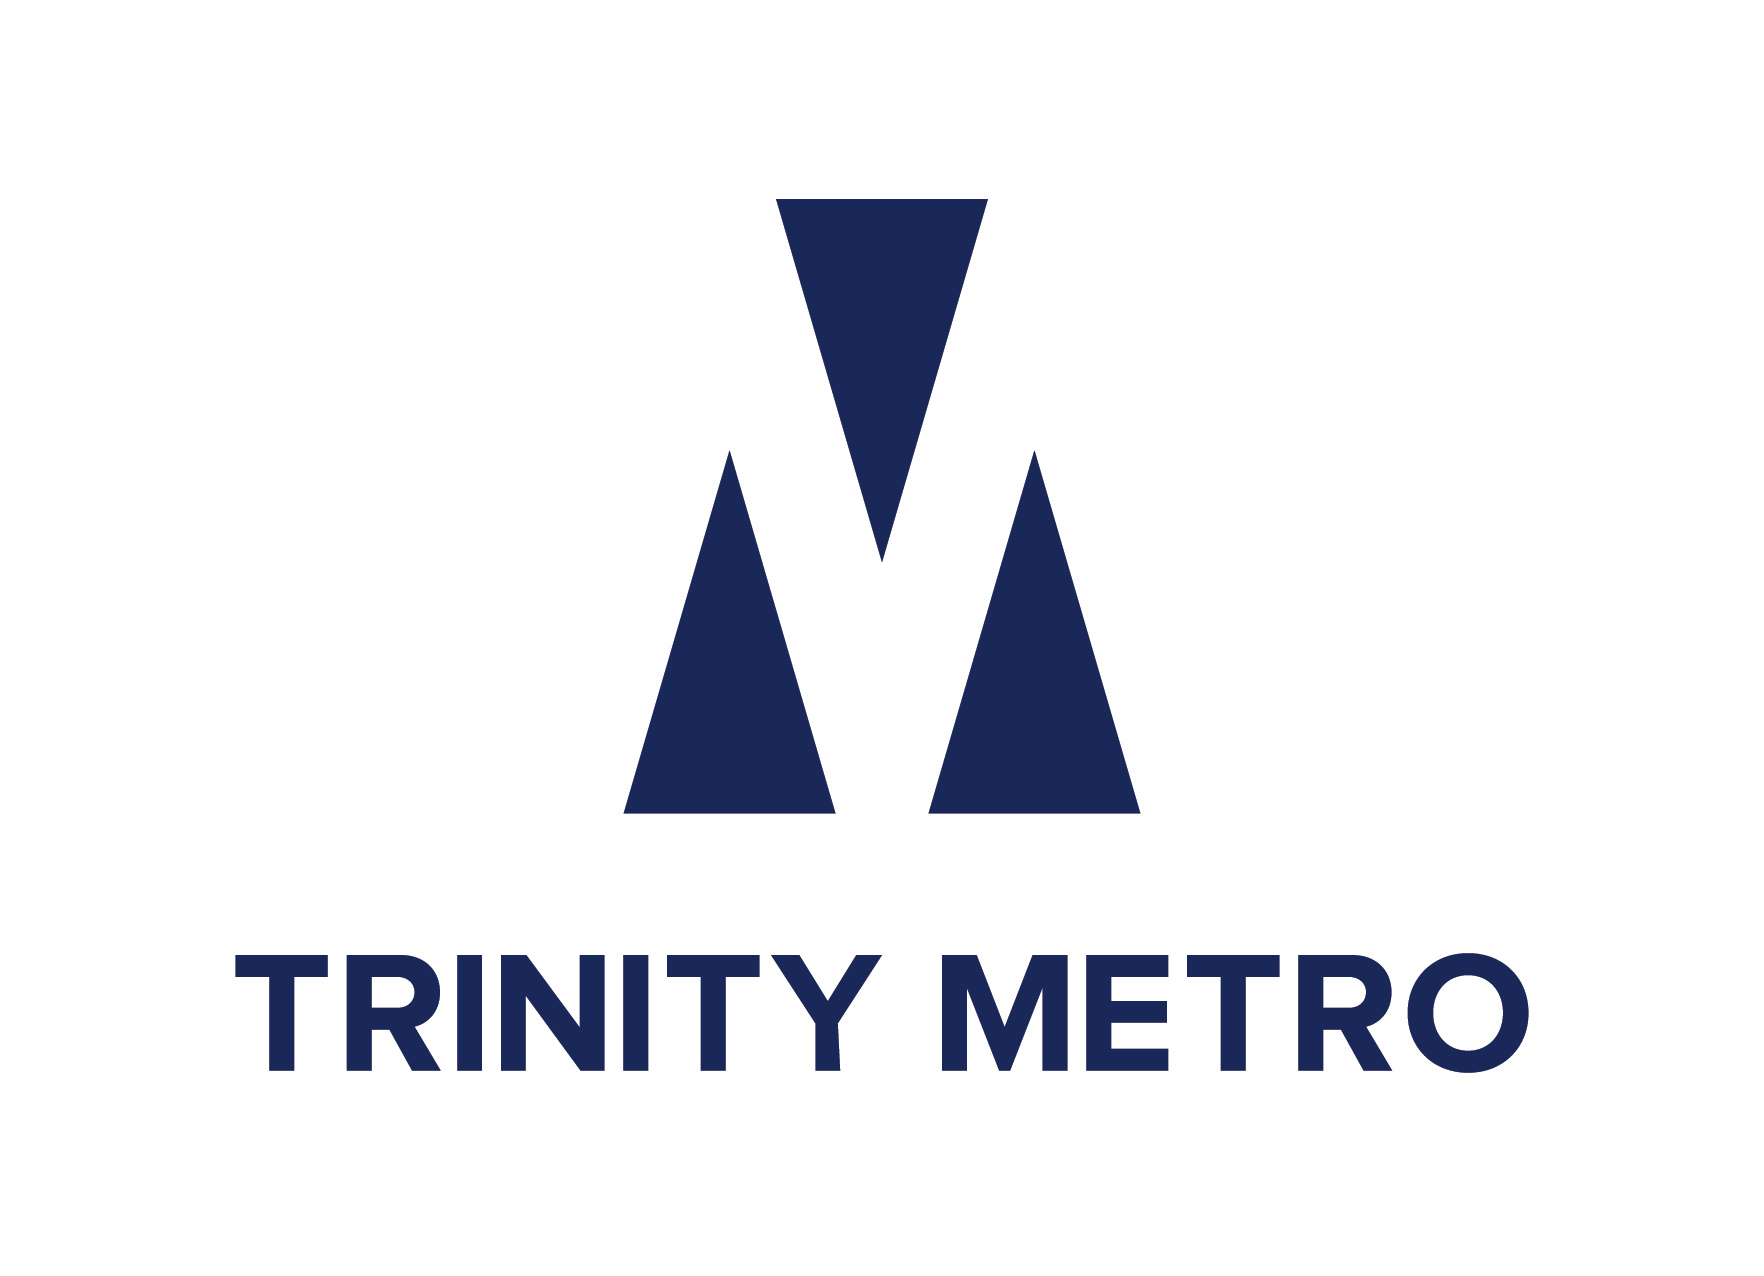 Trinity Metro